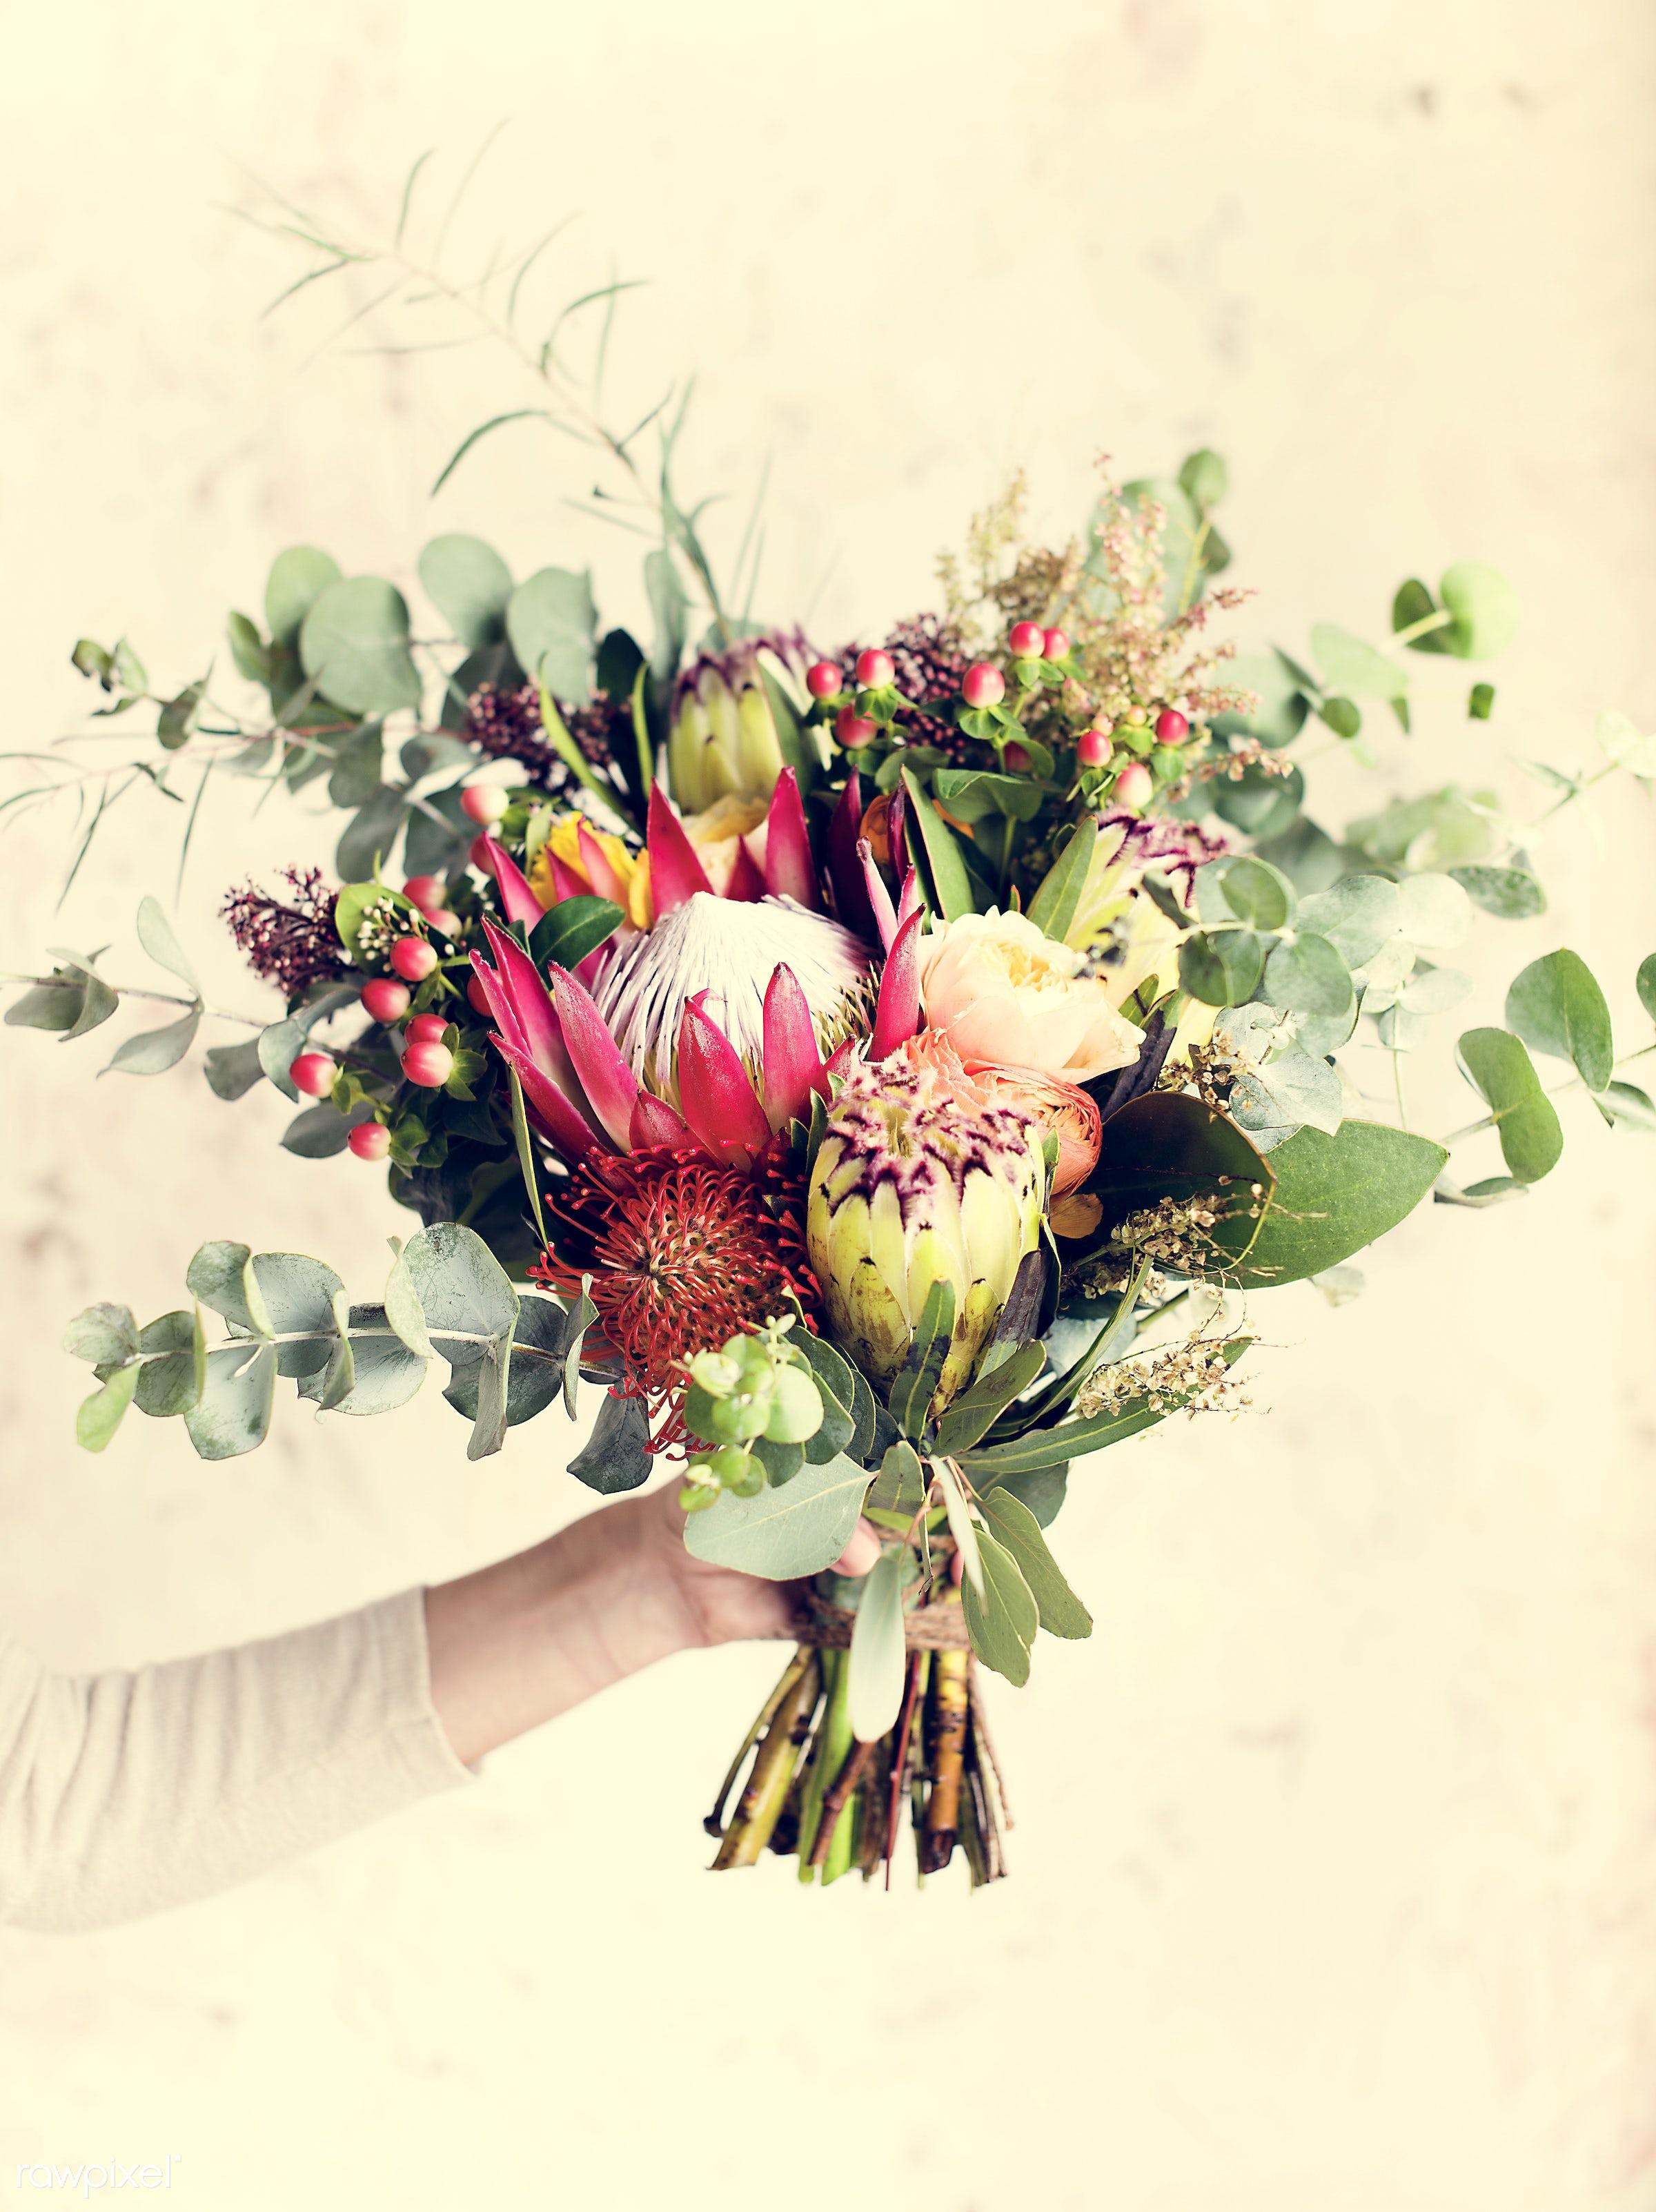 bouquet, person, detail, decorative, colorful, holding, diverse, events, plants, show, spring, people, blossom, love, decor...